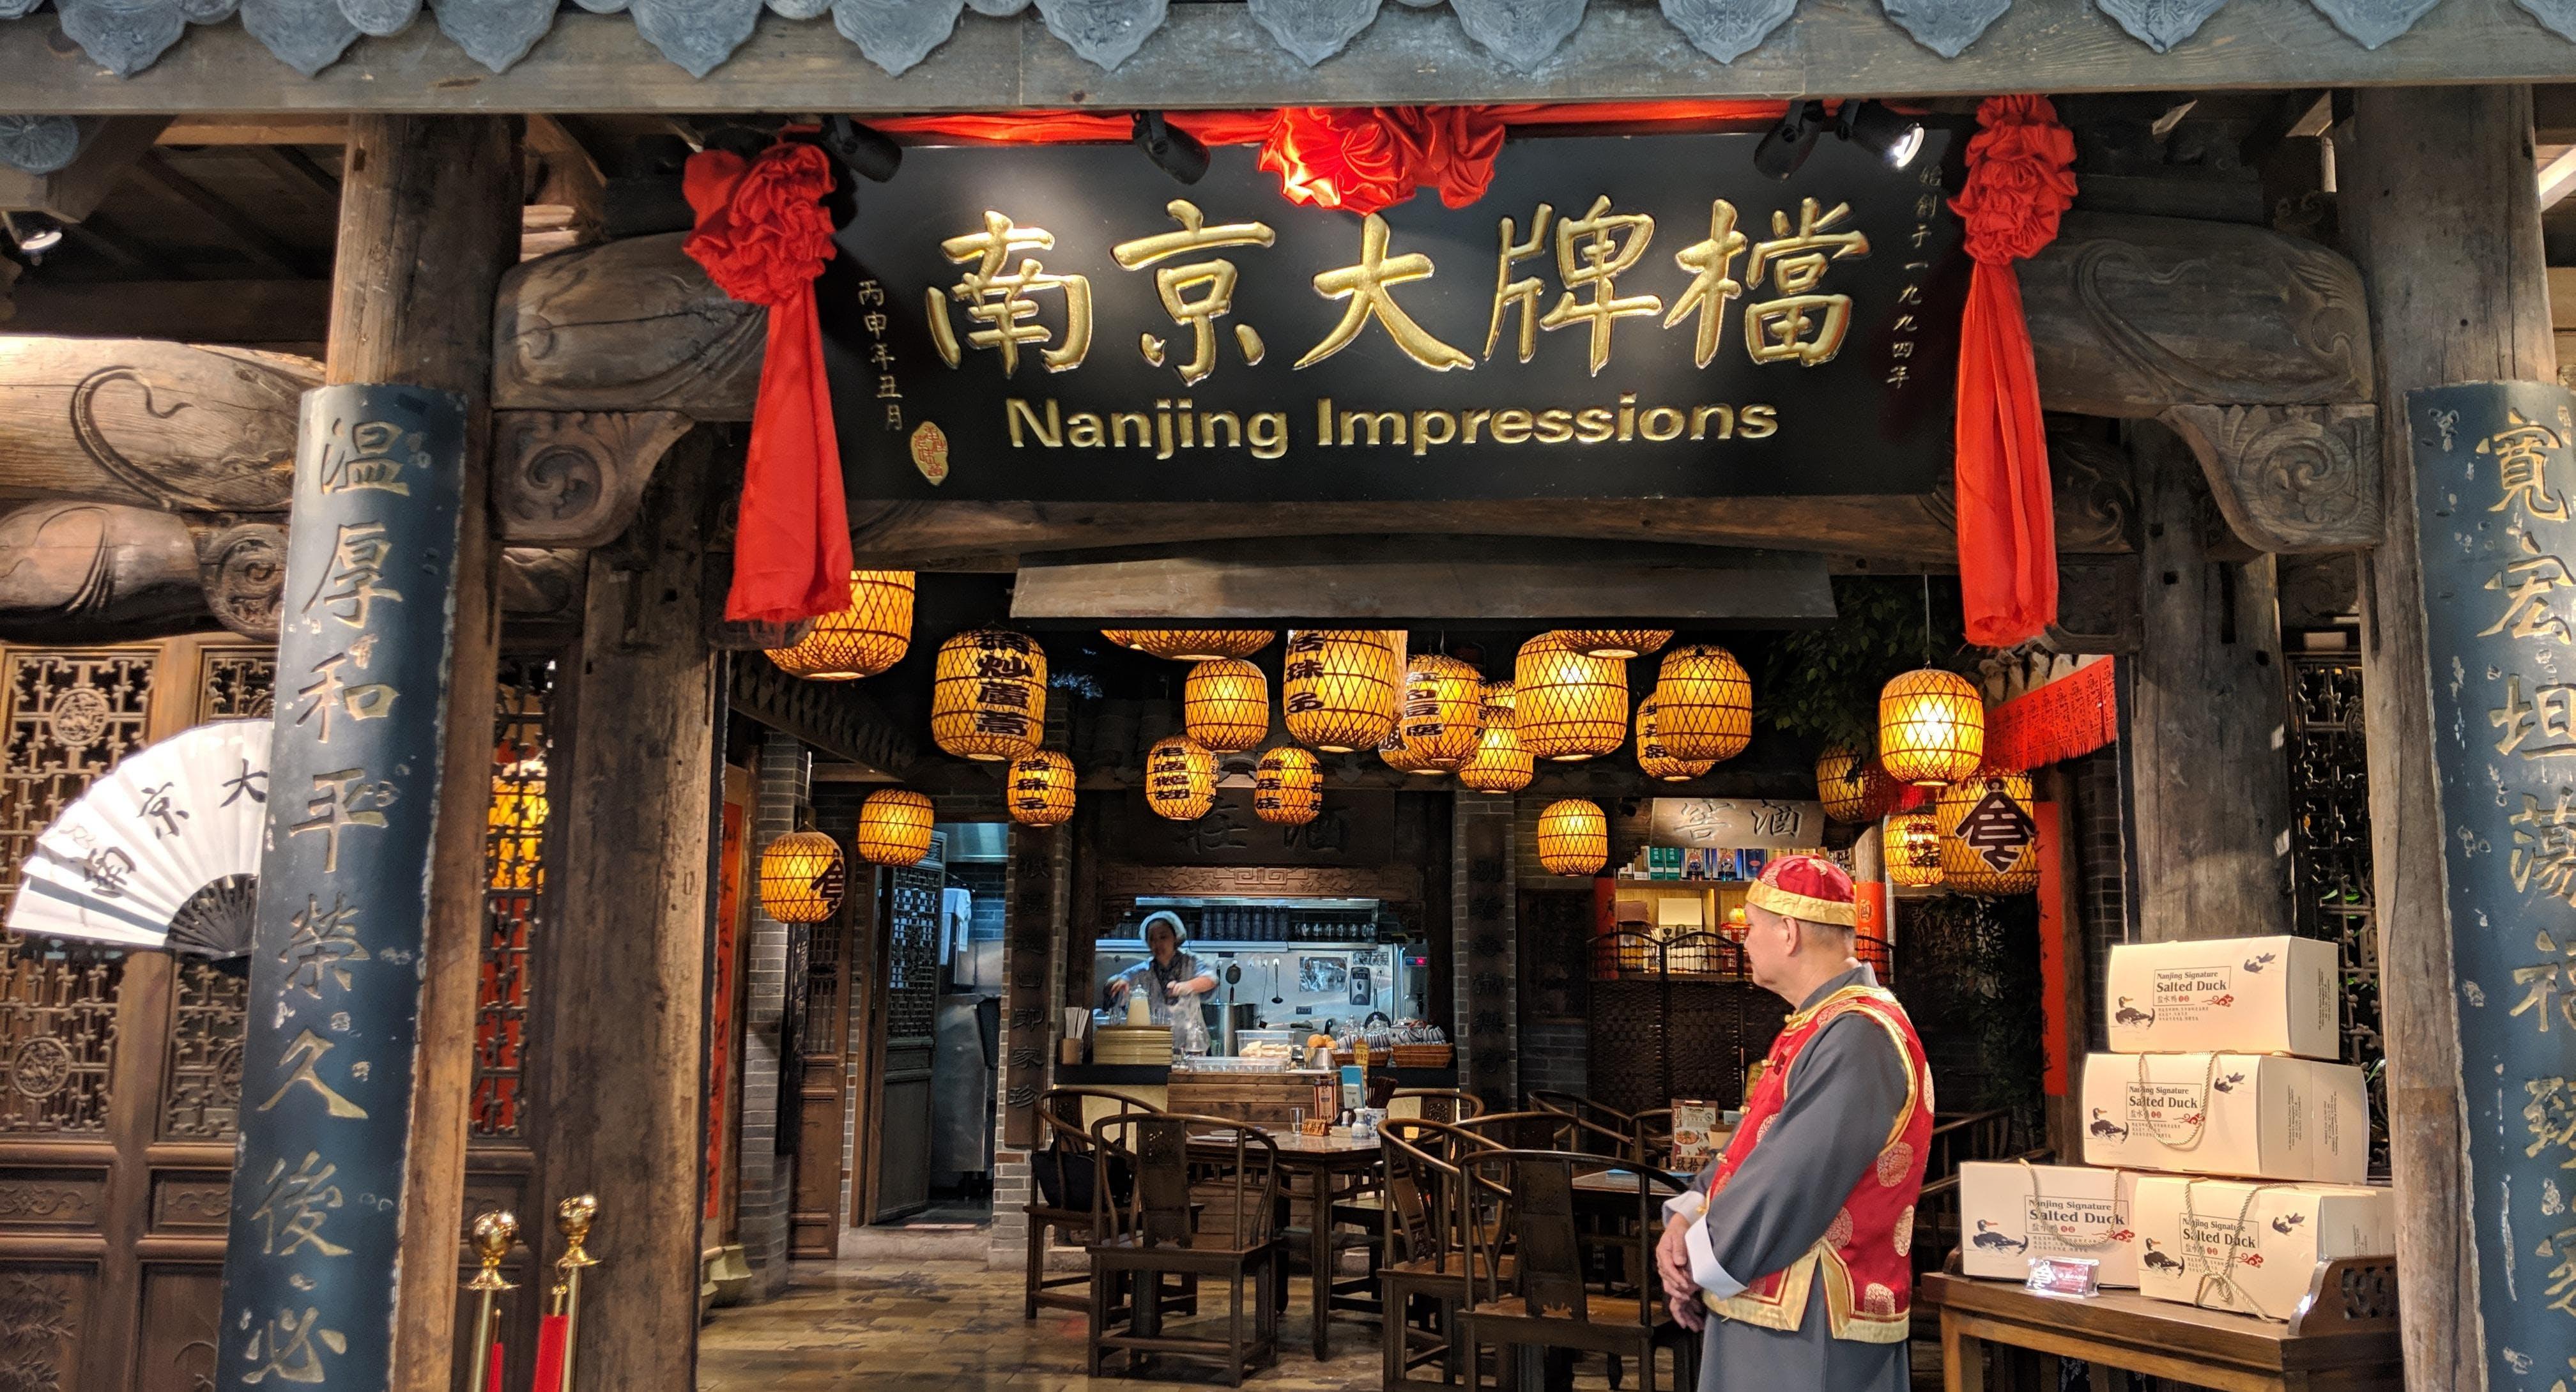 Nanjing Impressions Singapore image 1